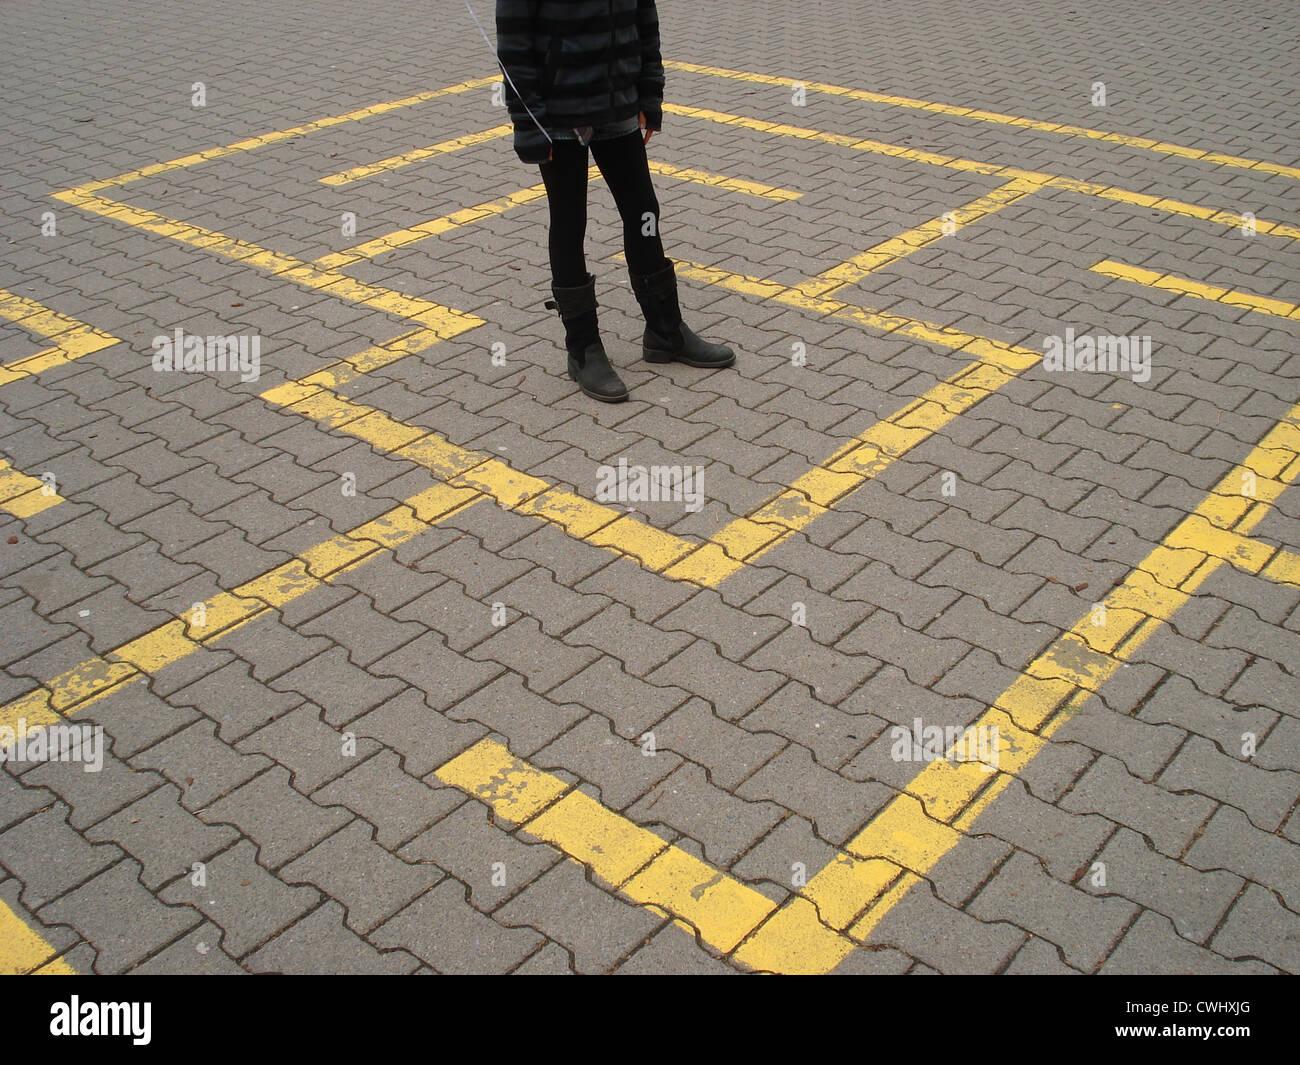 orientation,labyrinth - Stock Image